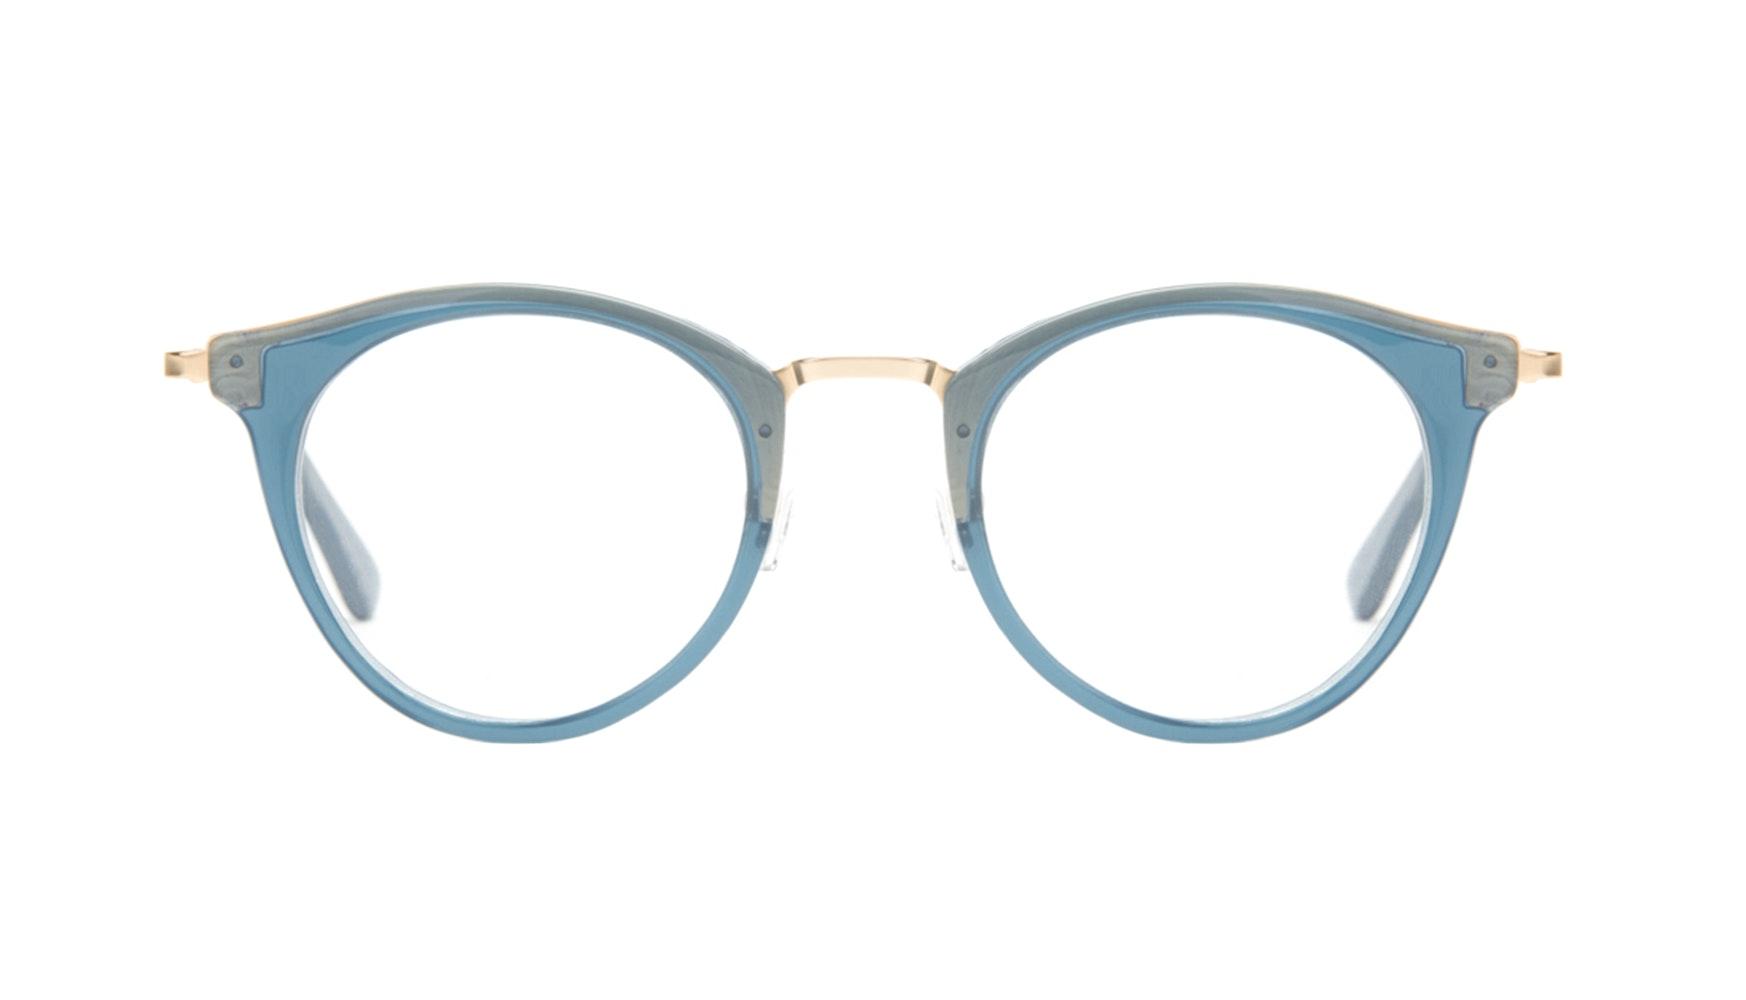 Affordable Fashion Glasses Cat Eye Round Eyeglasses Women Creature Marine Front